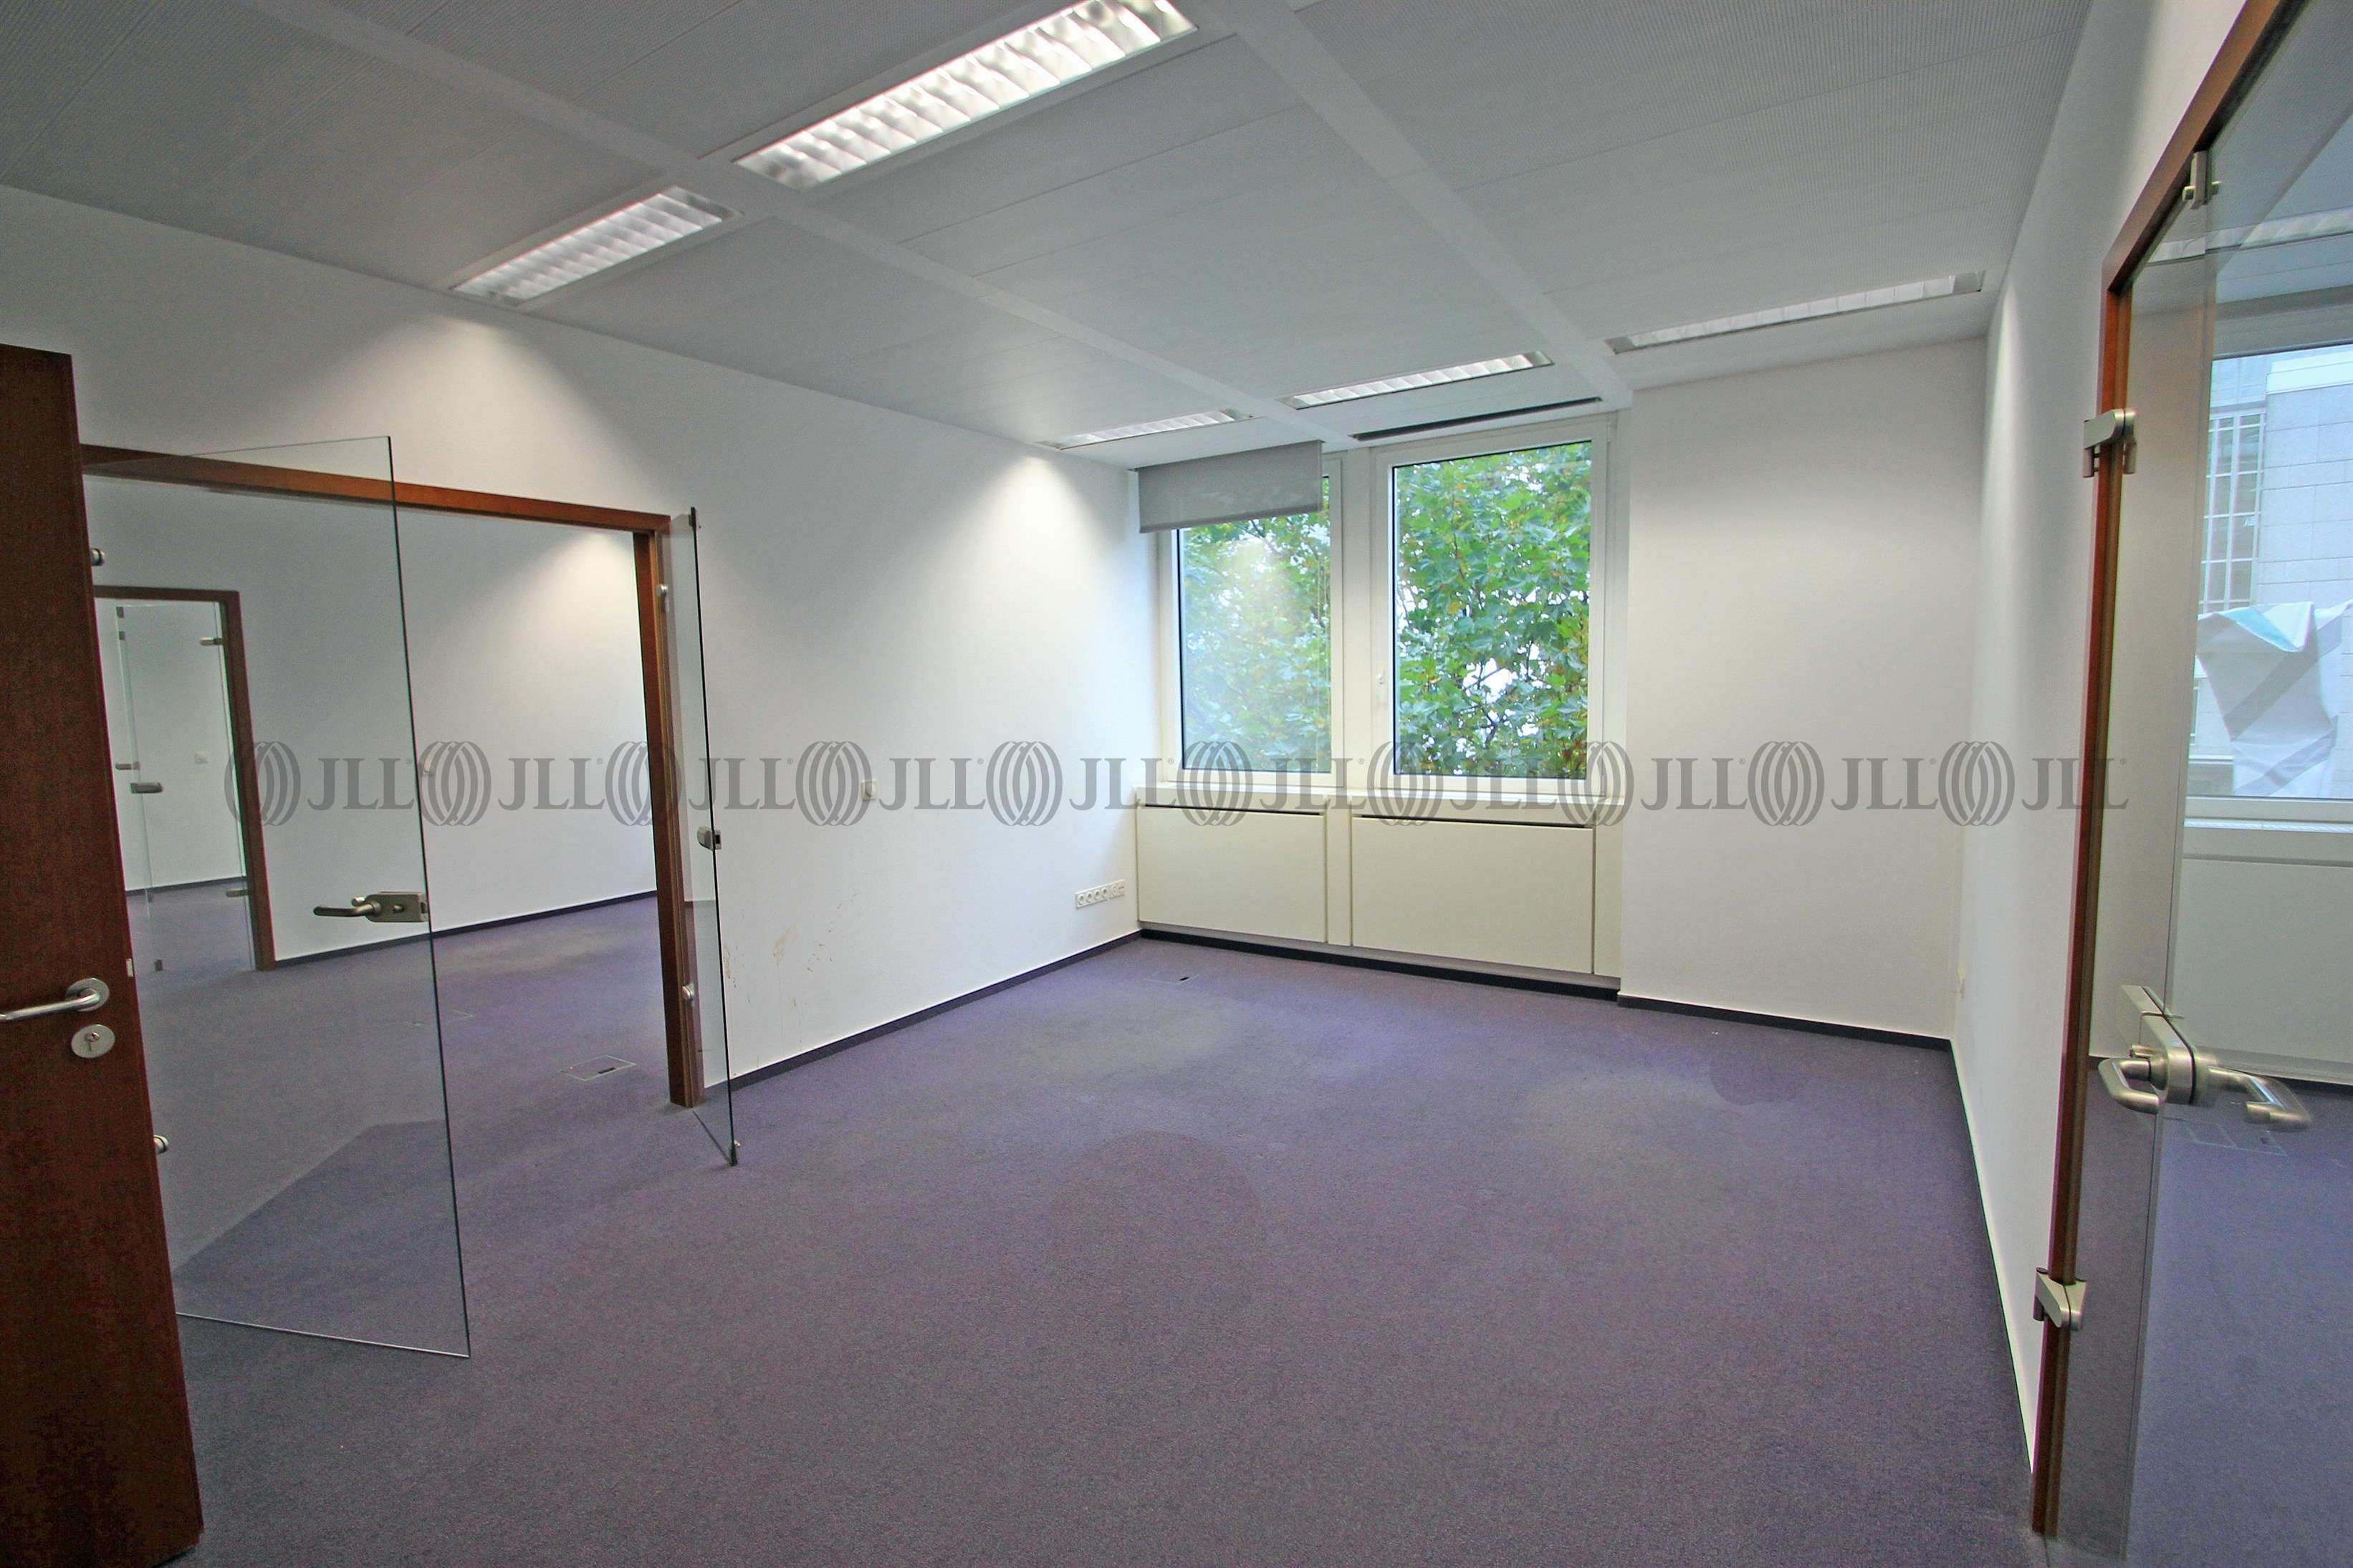 Büros Frankfurt am main, 60329 - Büro - Frankfurt am Main, Bahnhofsviertel - F0210 - 10054247